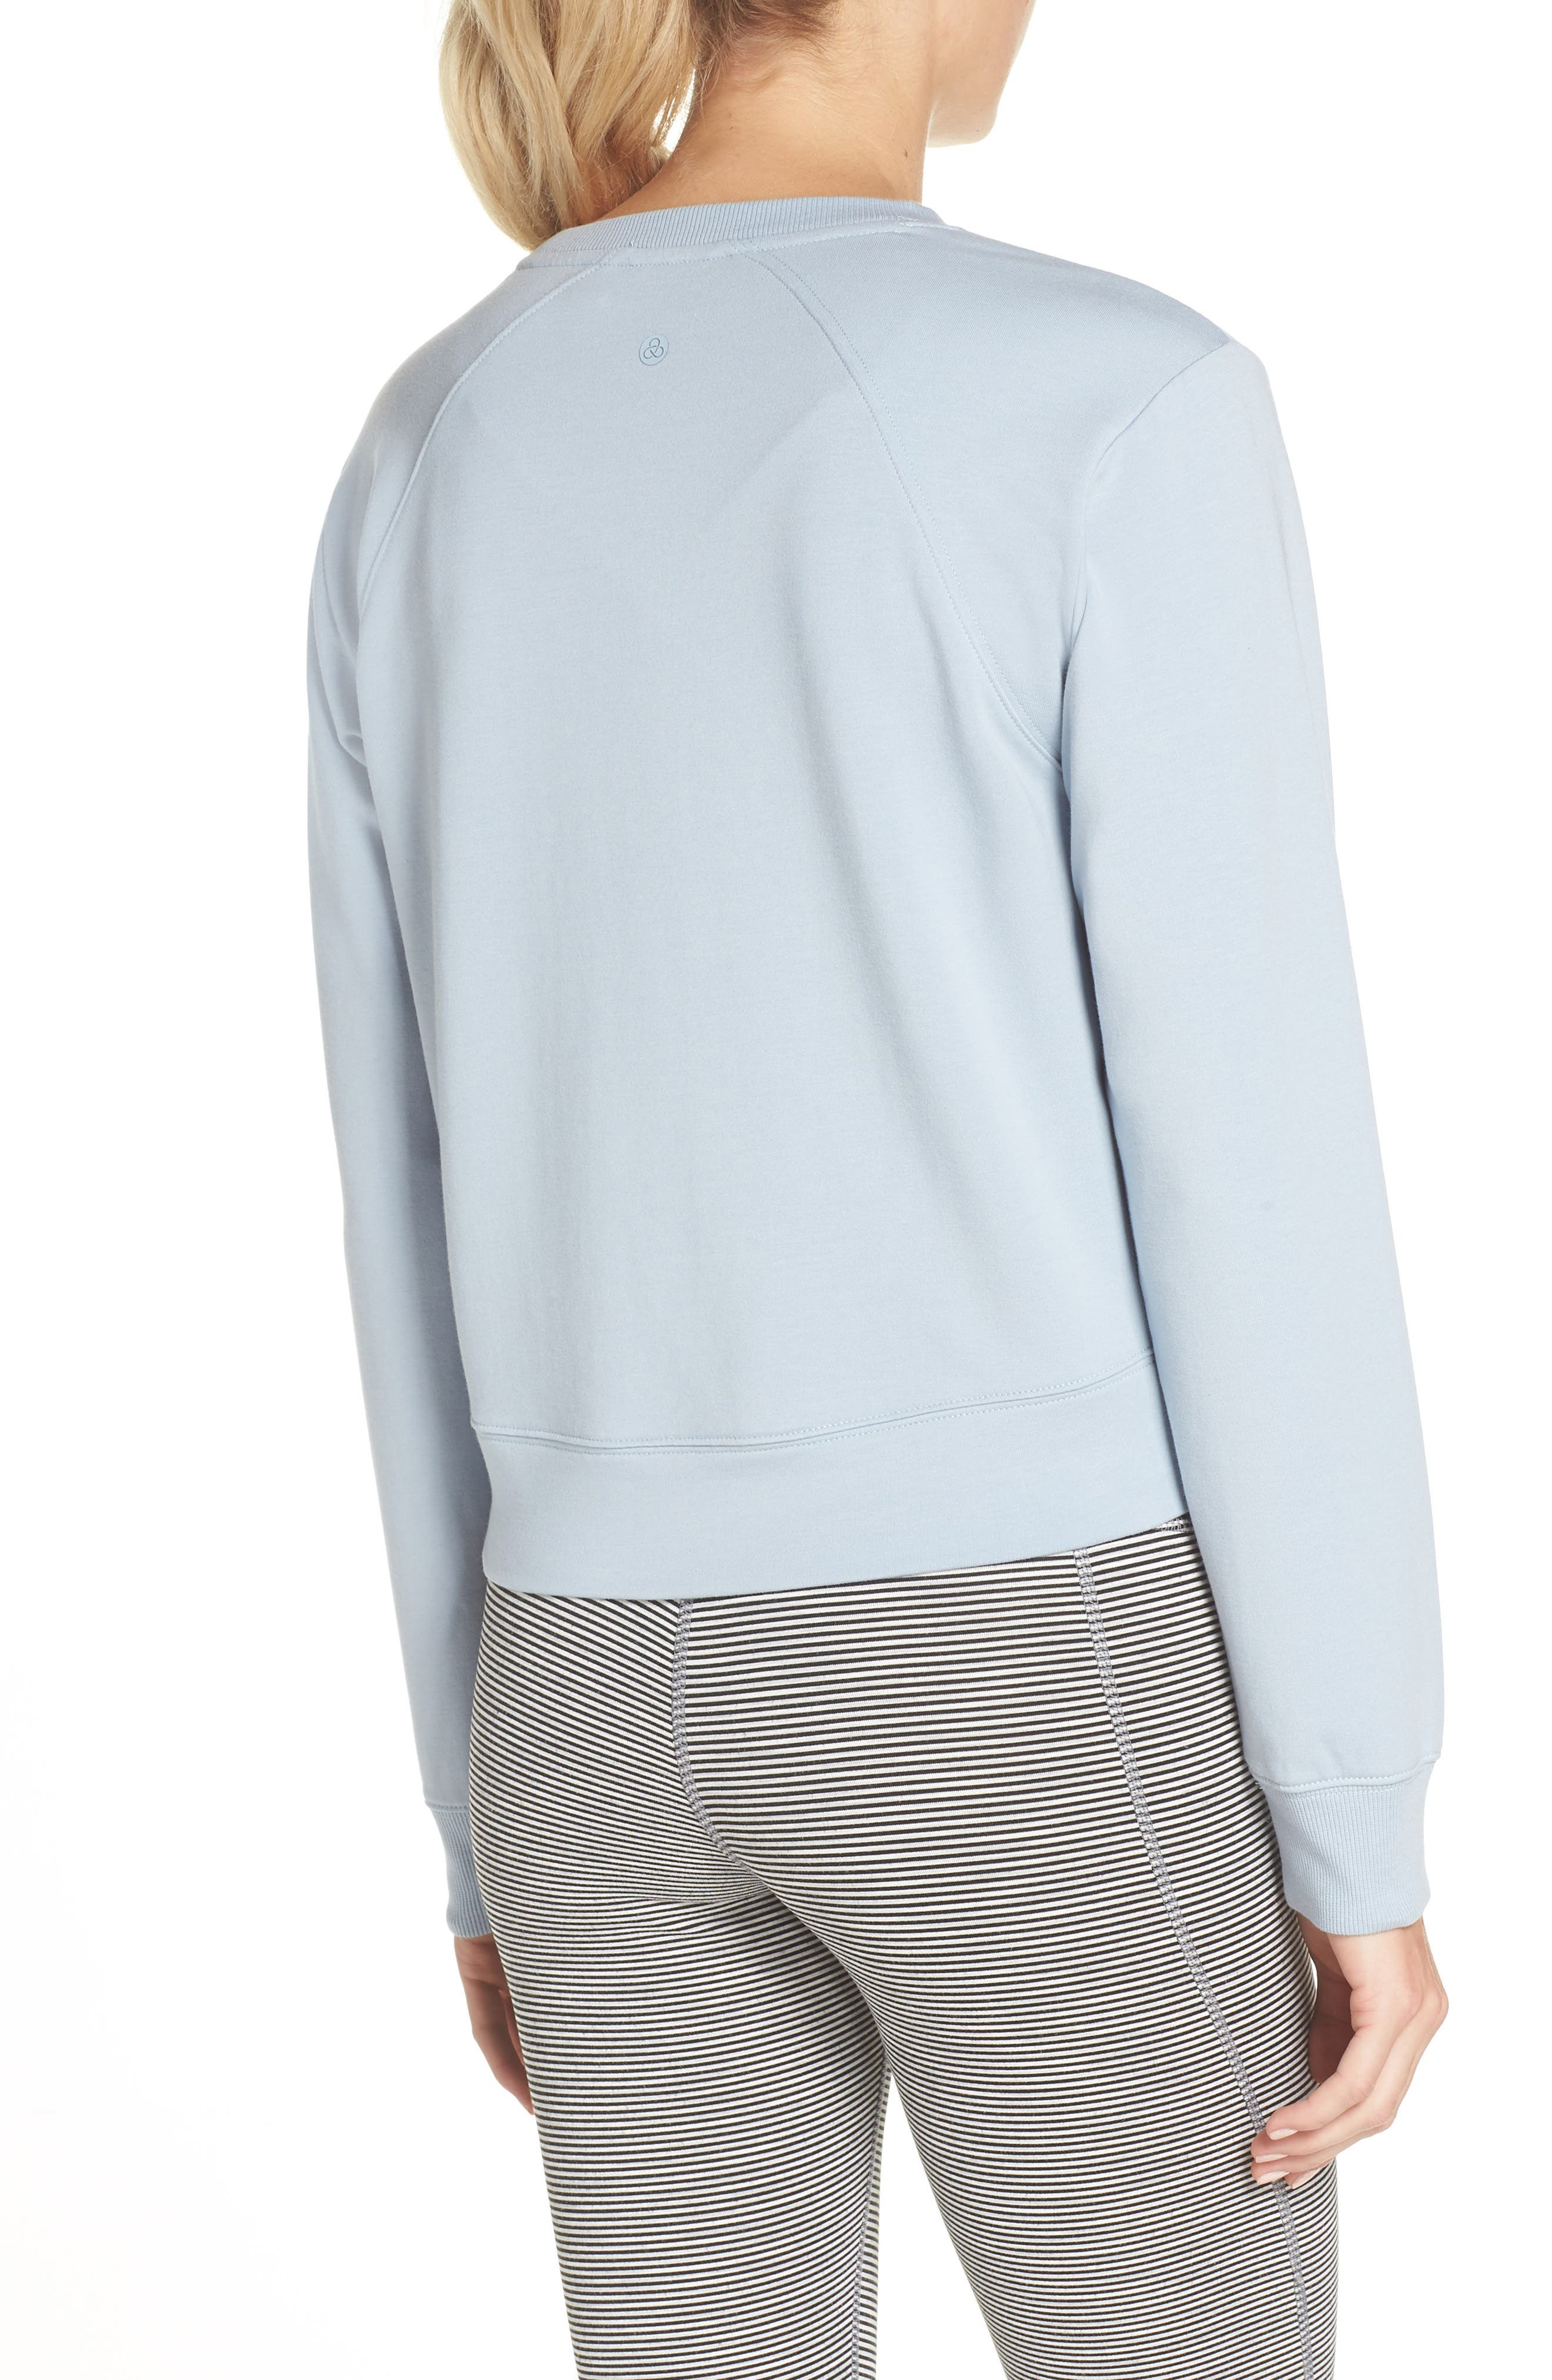 Uplifted Sweatshirt,                             Alternate thumbnail 2, color,                             420